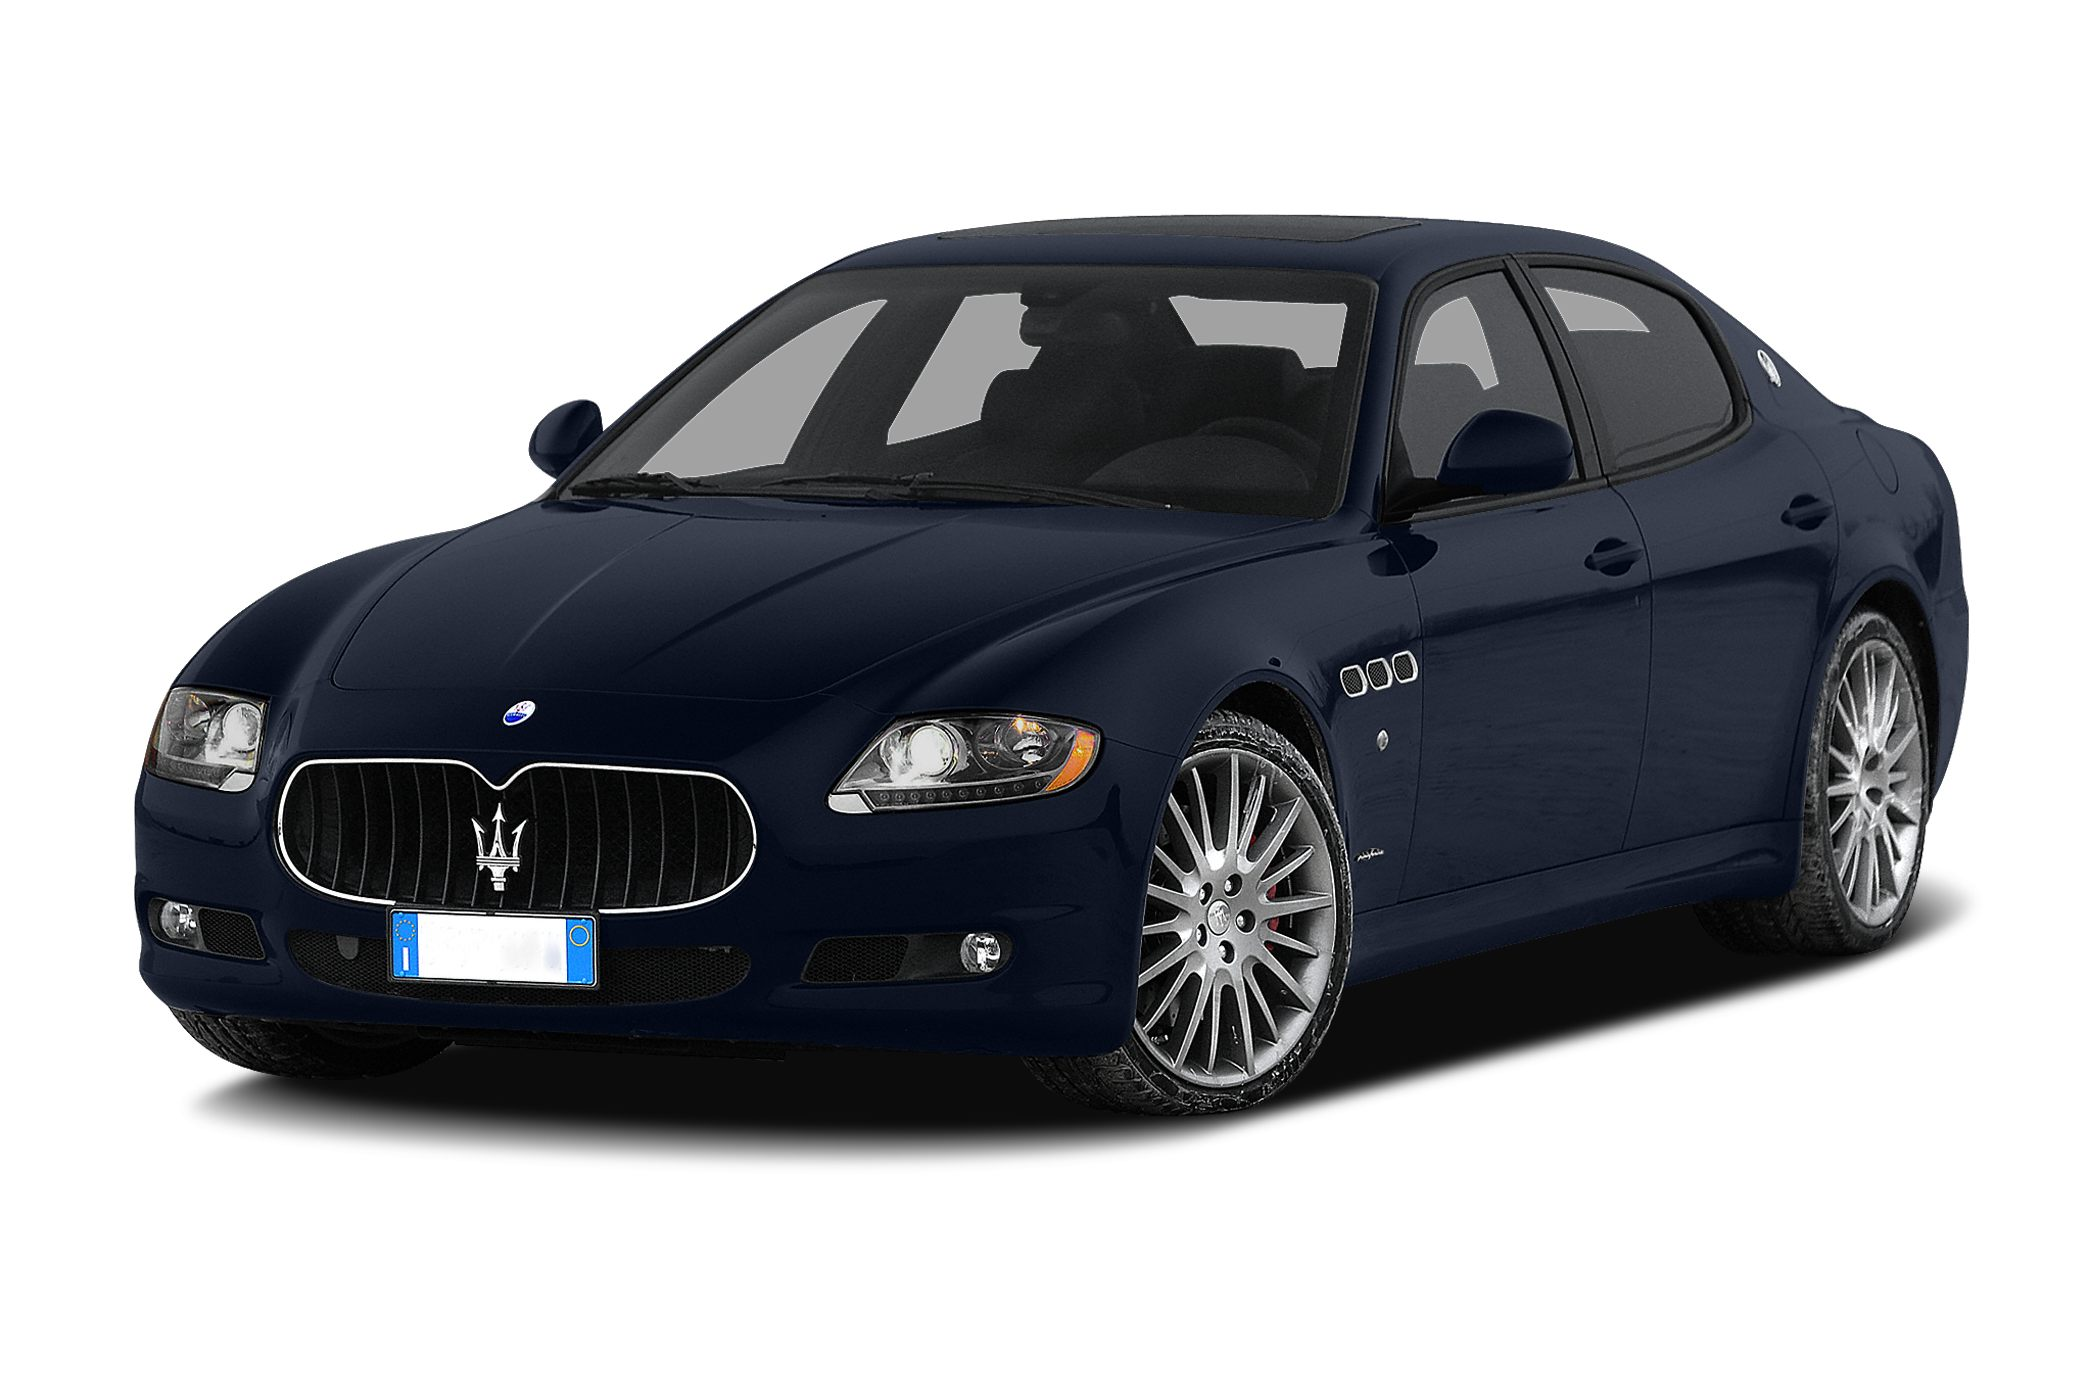 2009 maserati quattroporte sport gt s 4dr sedan specs and prices